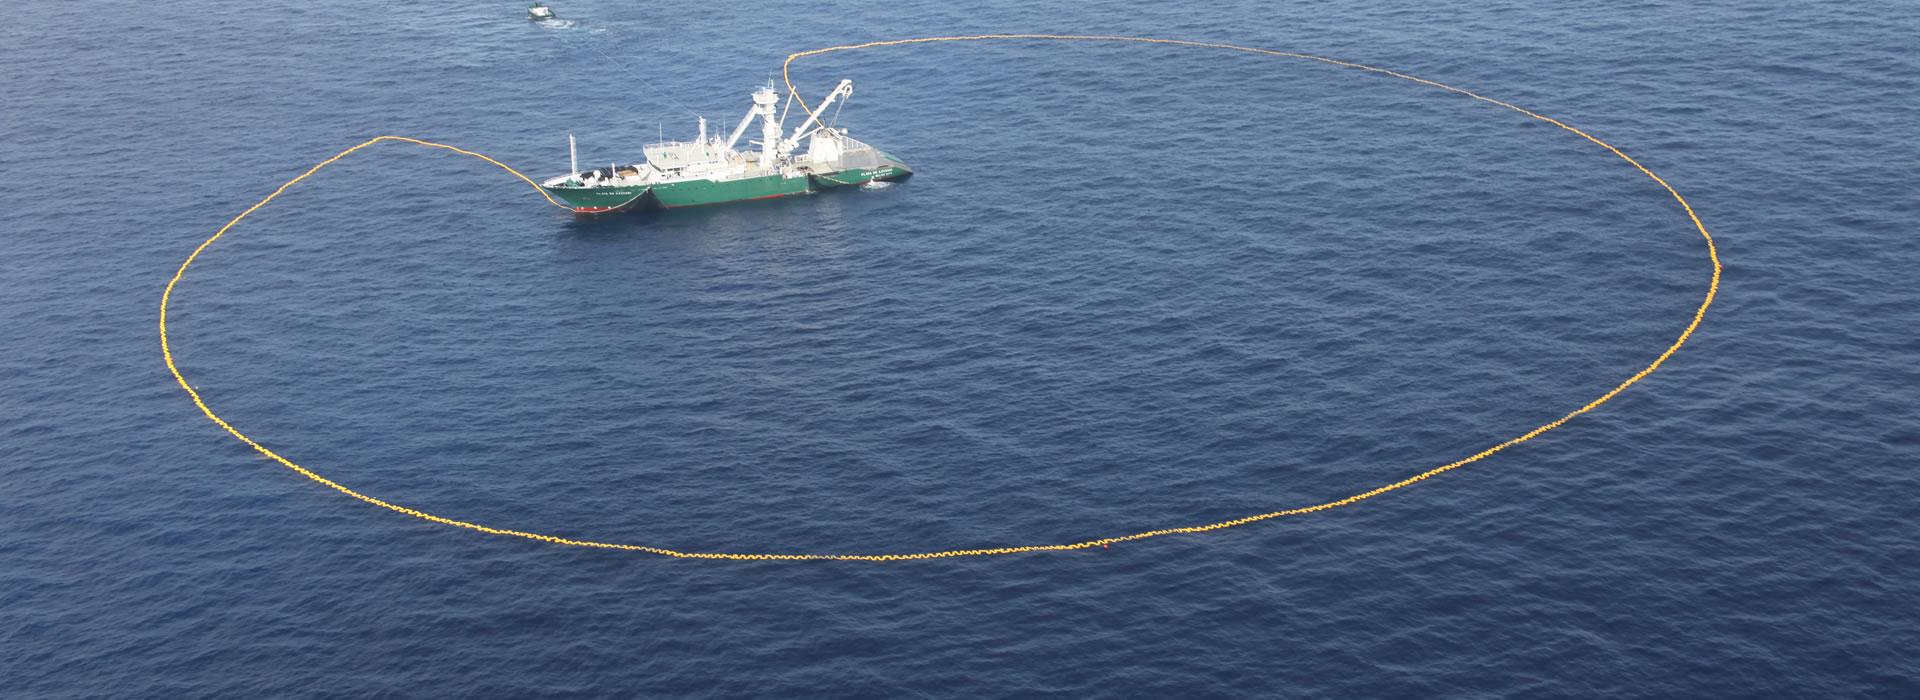 media redes de pesca